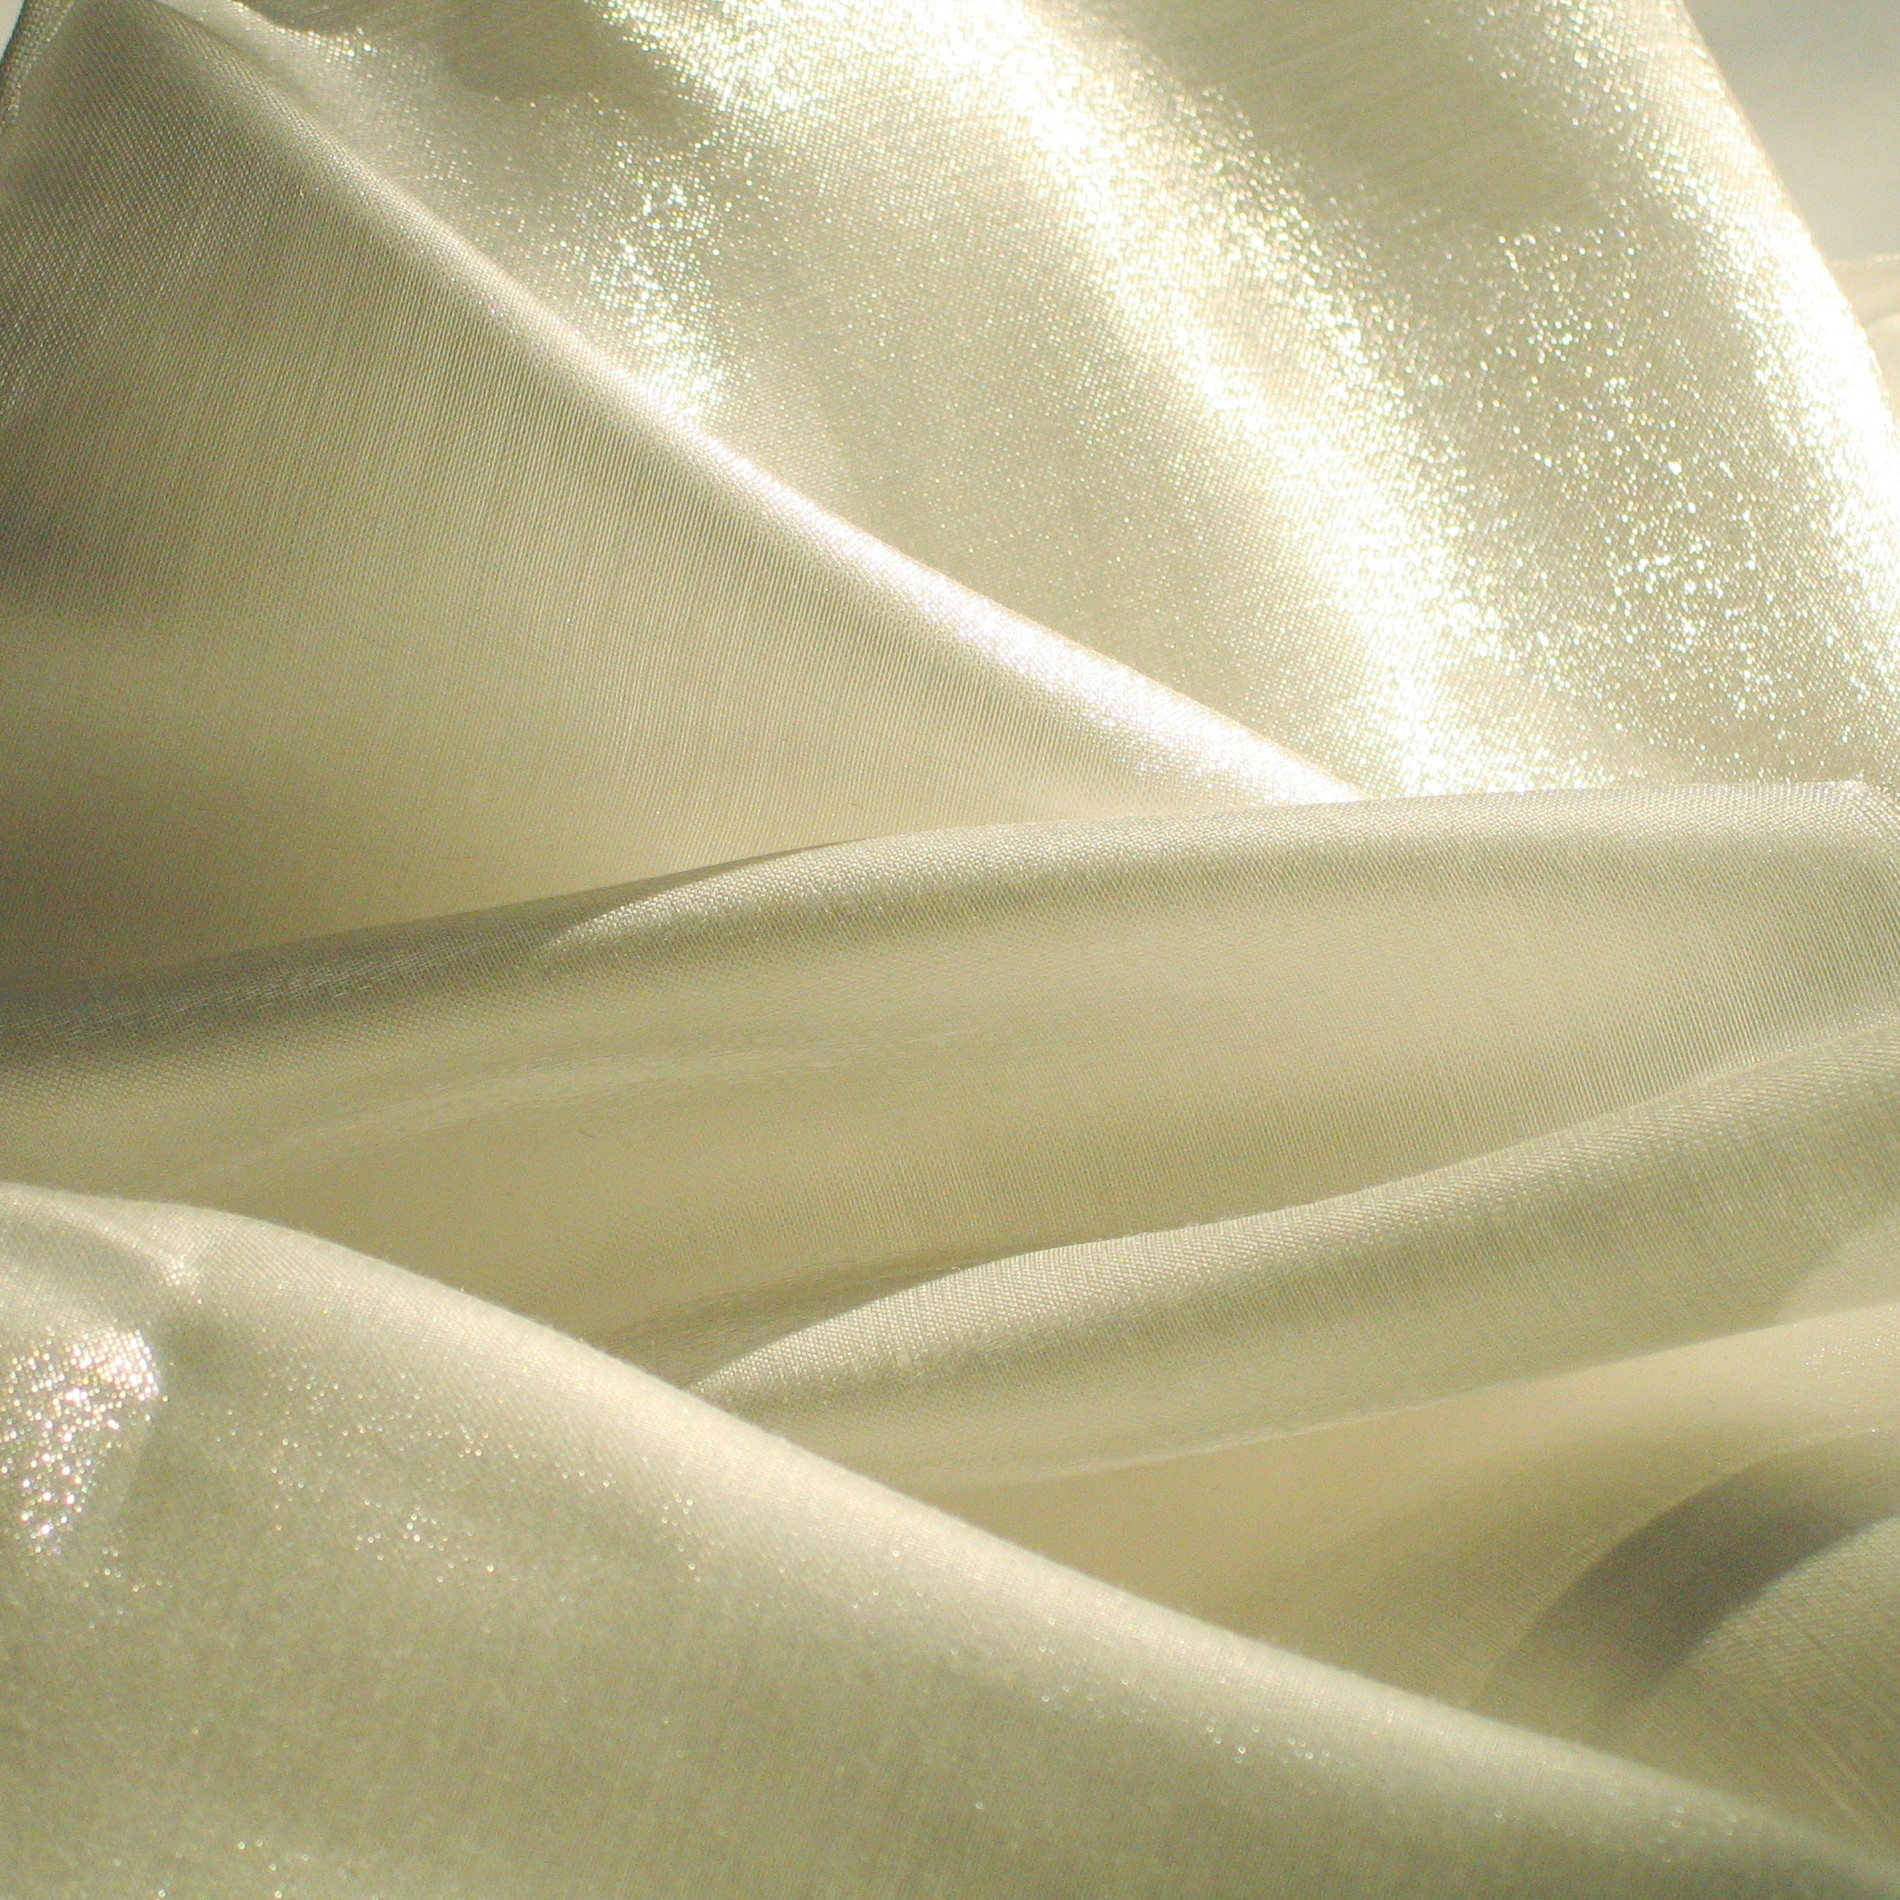 futter glanzstoff neue farbe in off white futterstoffe. Black Bedroom Furniture Sets. Home Design Ideas